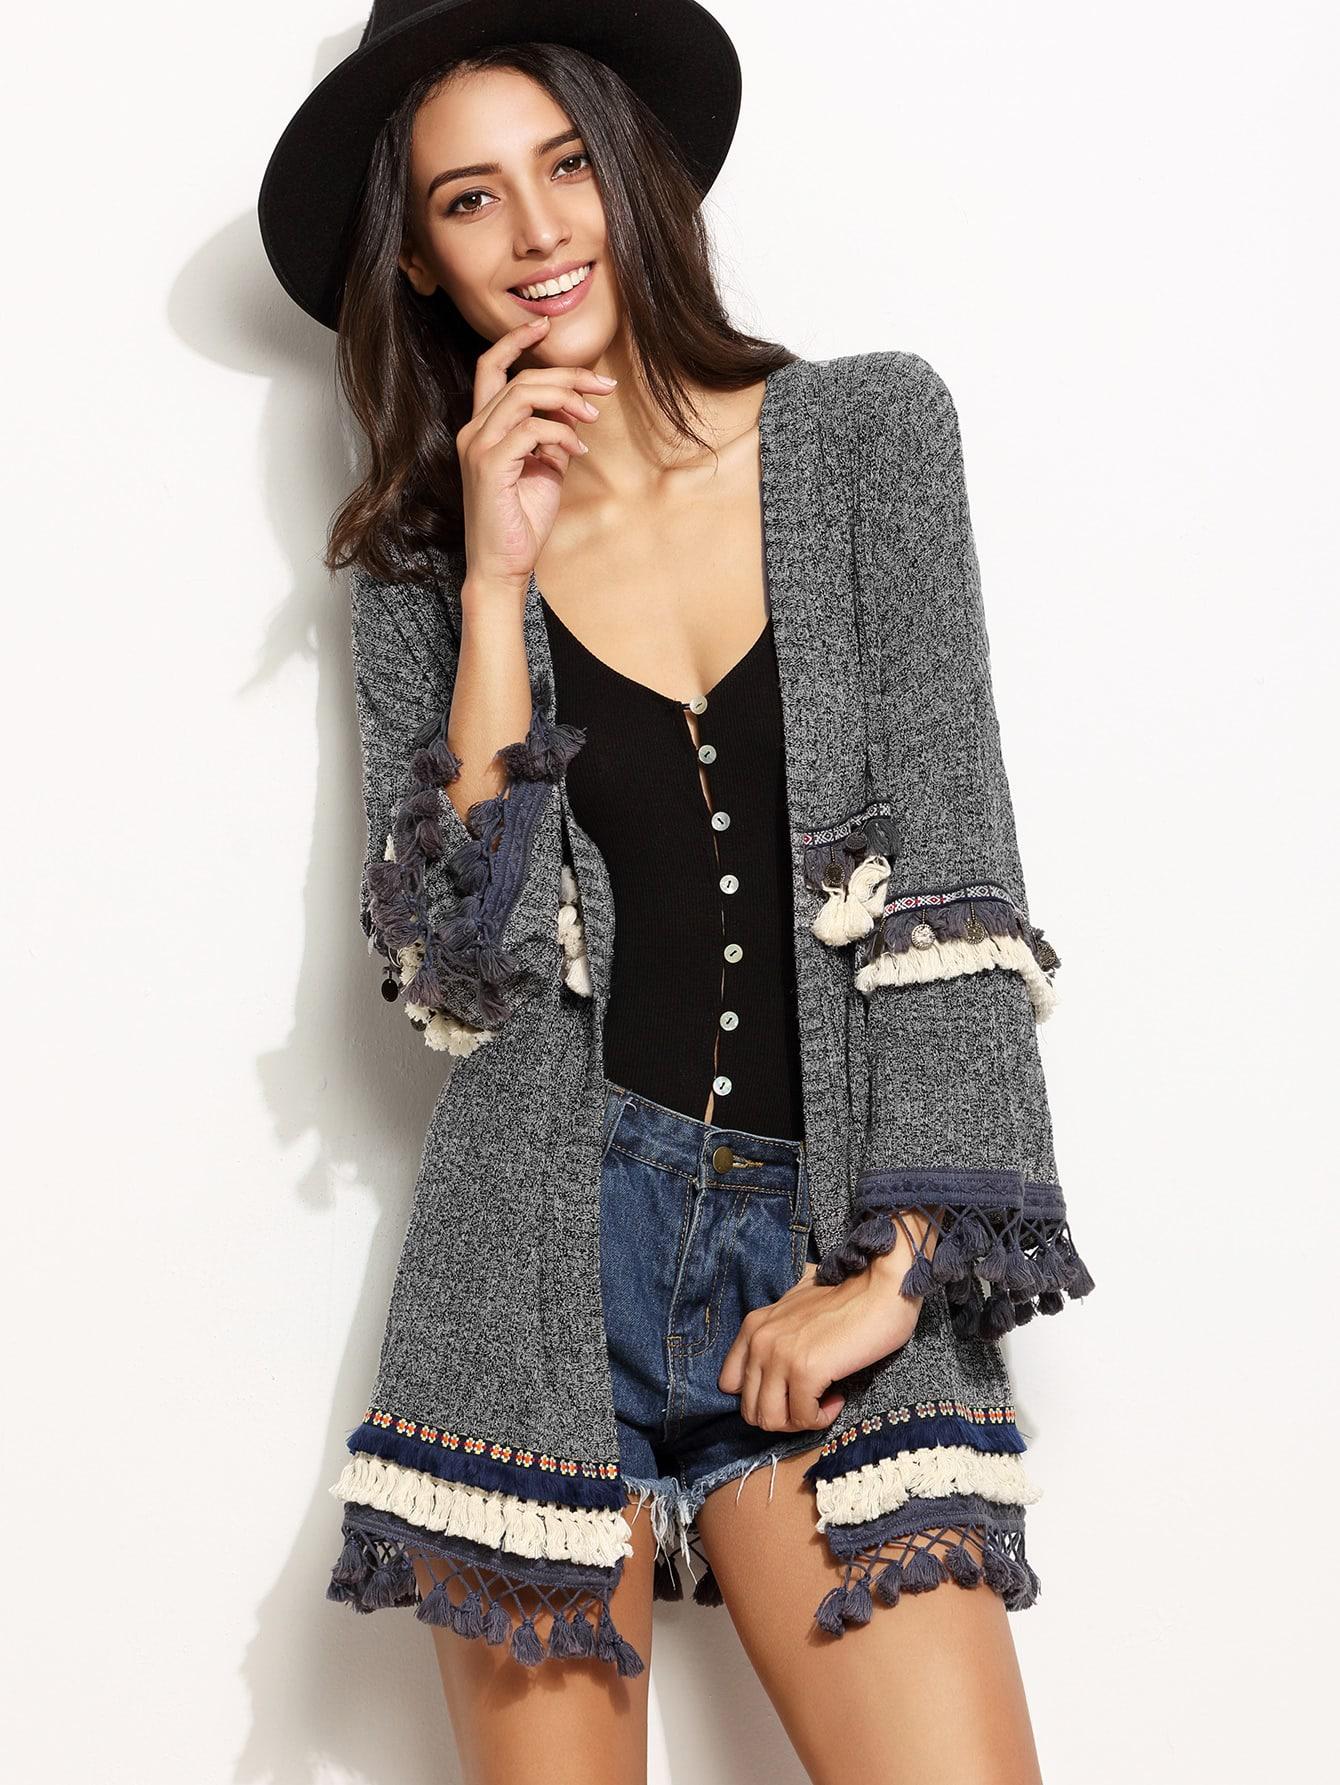 Grey Marled Knit Cardigan With Embroidered Tape And Fringe Detail пылесборник для сухой уборки topperr er 2